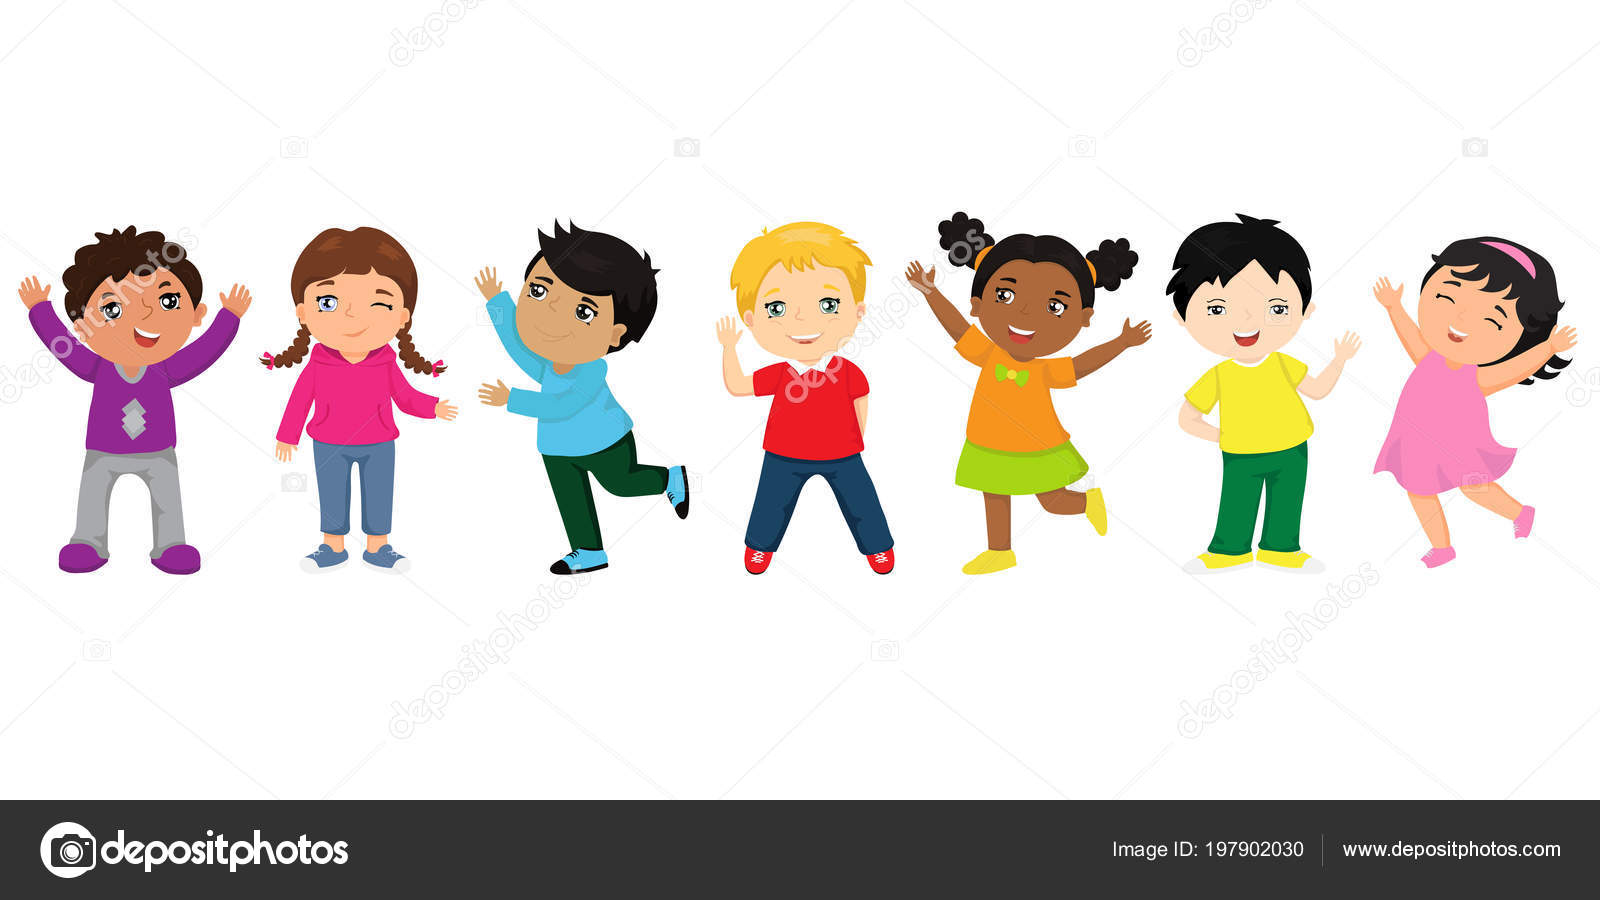 Para Niños De Dibujos Animados Caras Diferentes: Imágenes: Animadas De Niños Diferentes